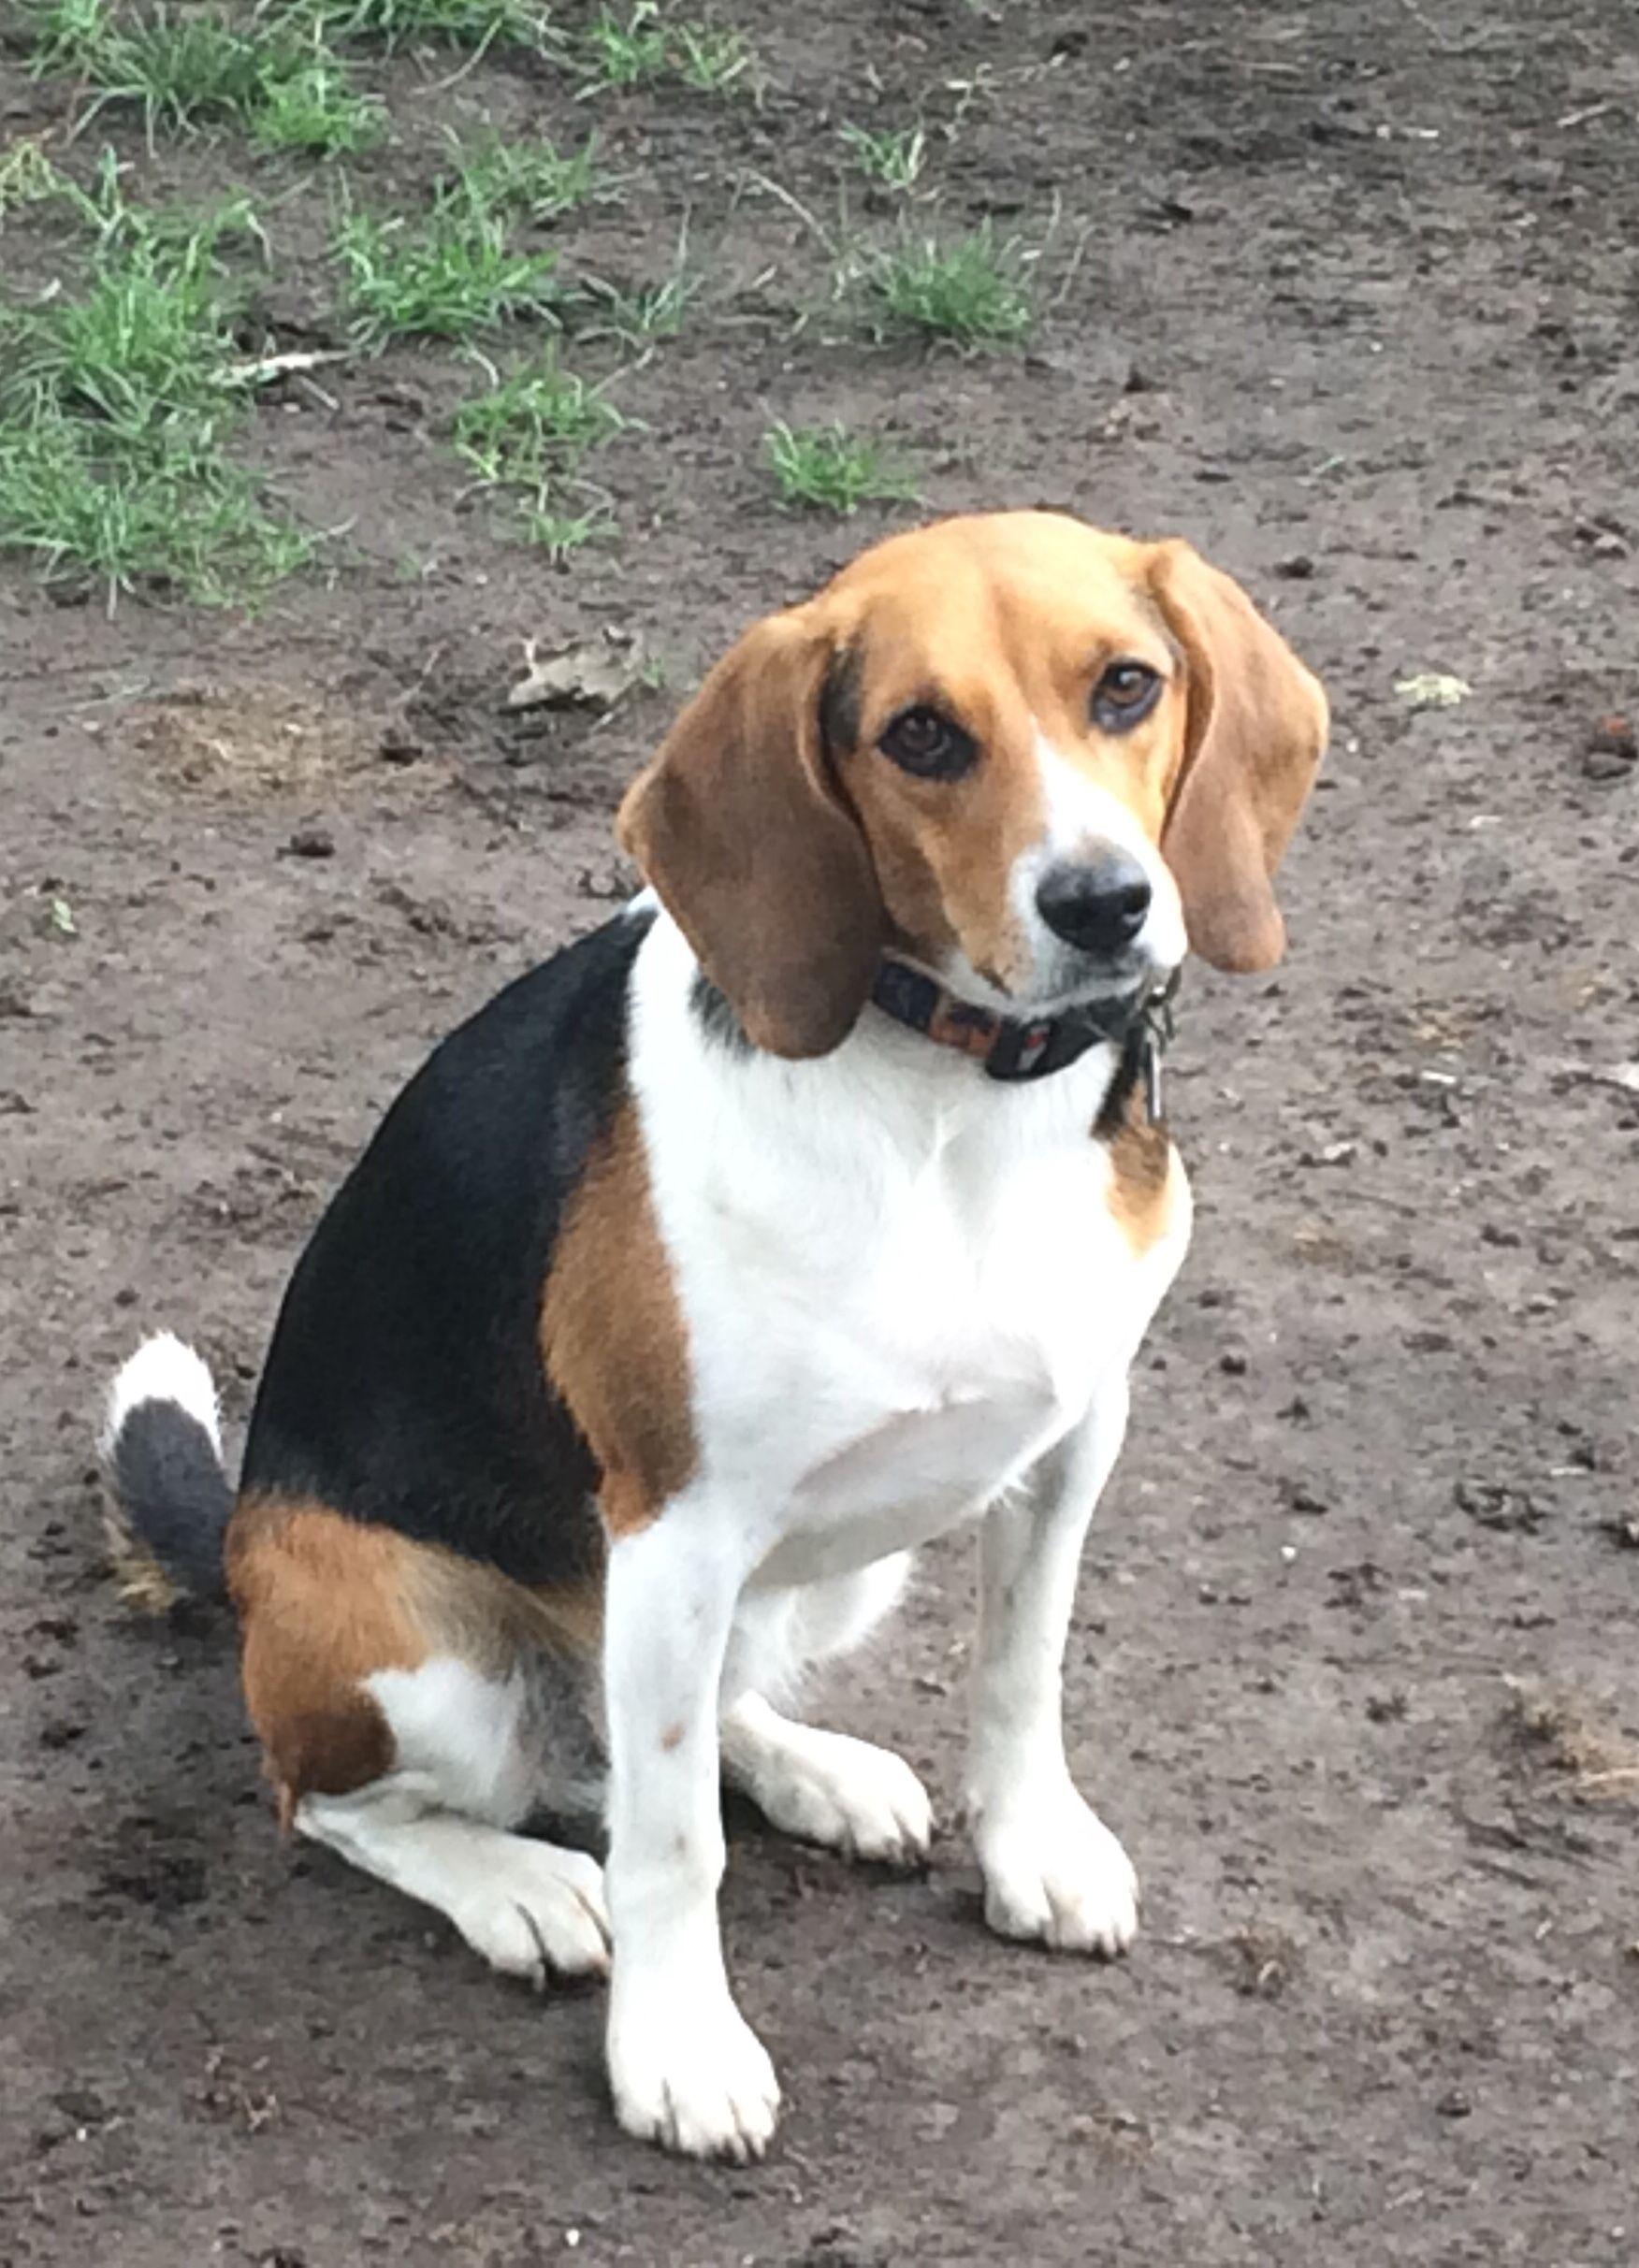 Pin By Rebecca Brockett On Beagles Corgi Beagle Dogs